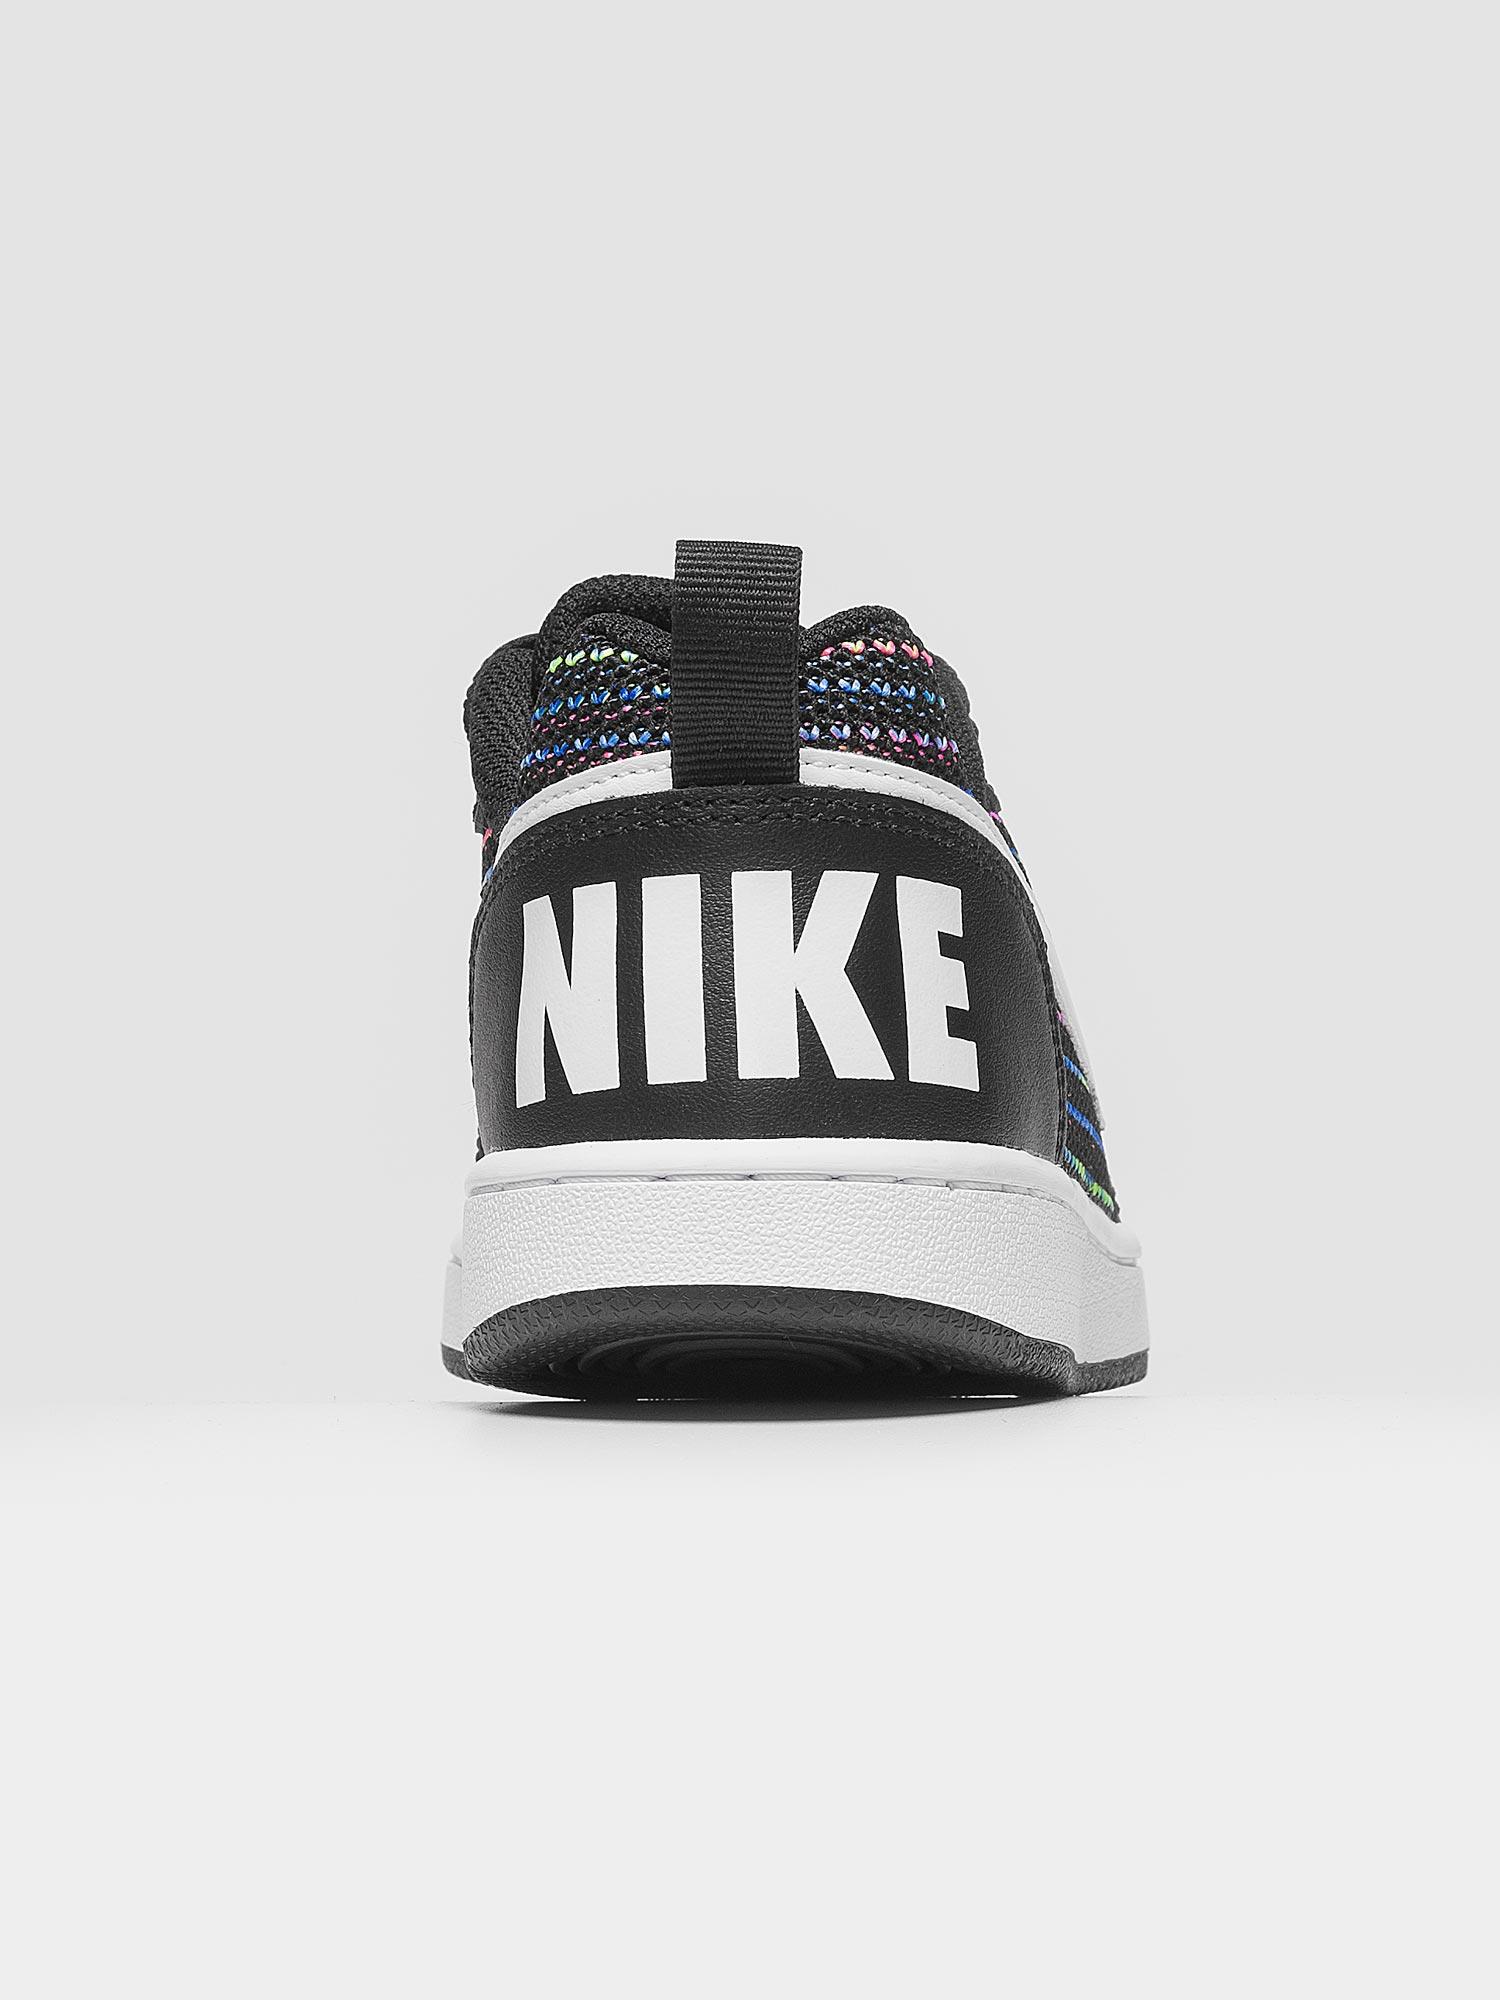 Nike Court Borough Low Se GS Nero Bianco Multicolor Art. AA2902 001. Nike  aa2902 001 01  Nike aa2902 001 03 ... e1ecf8f67d120